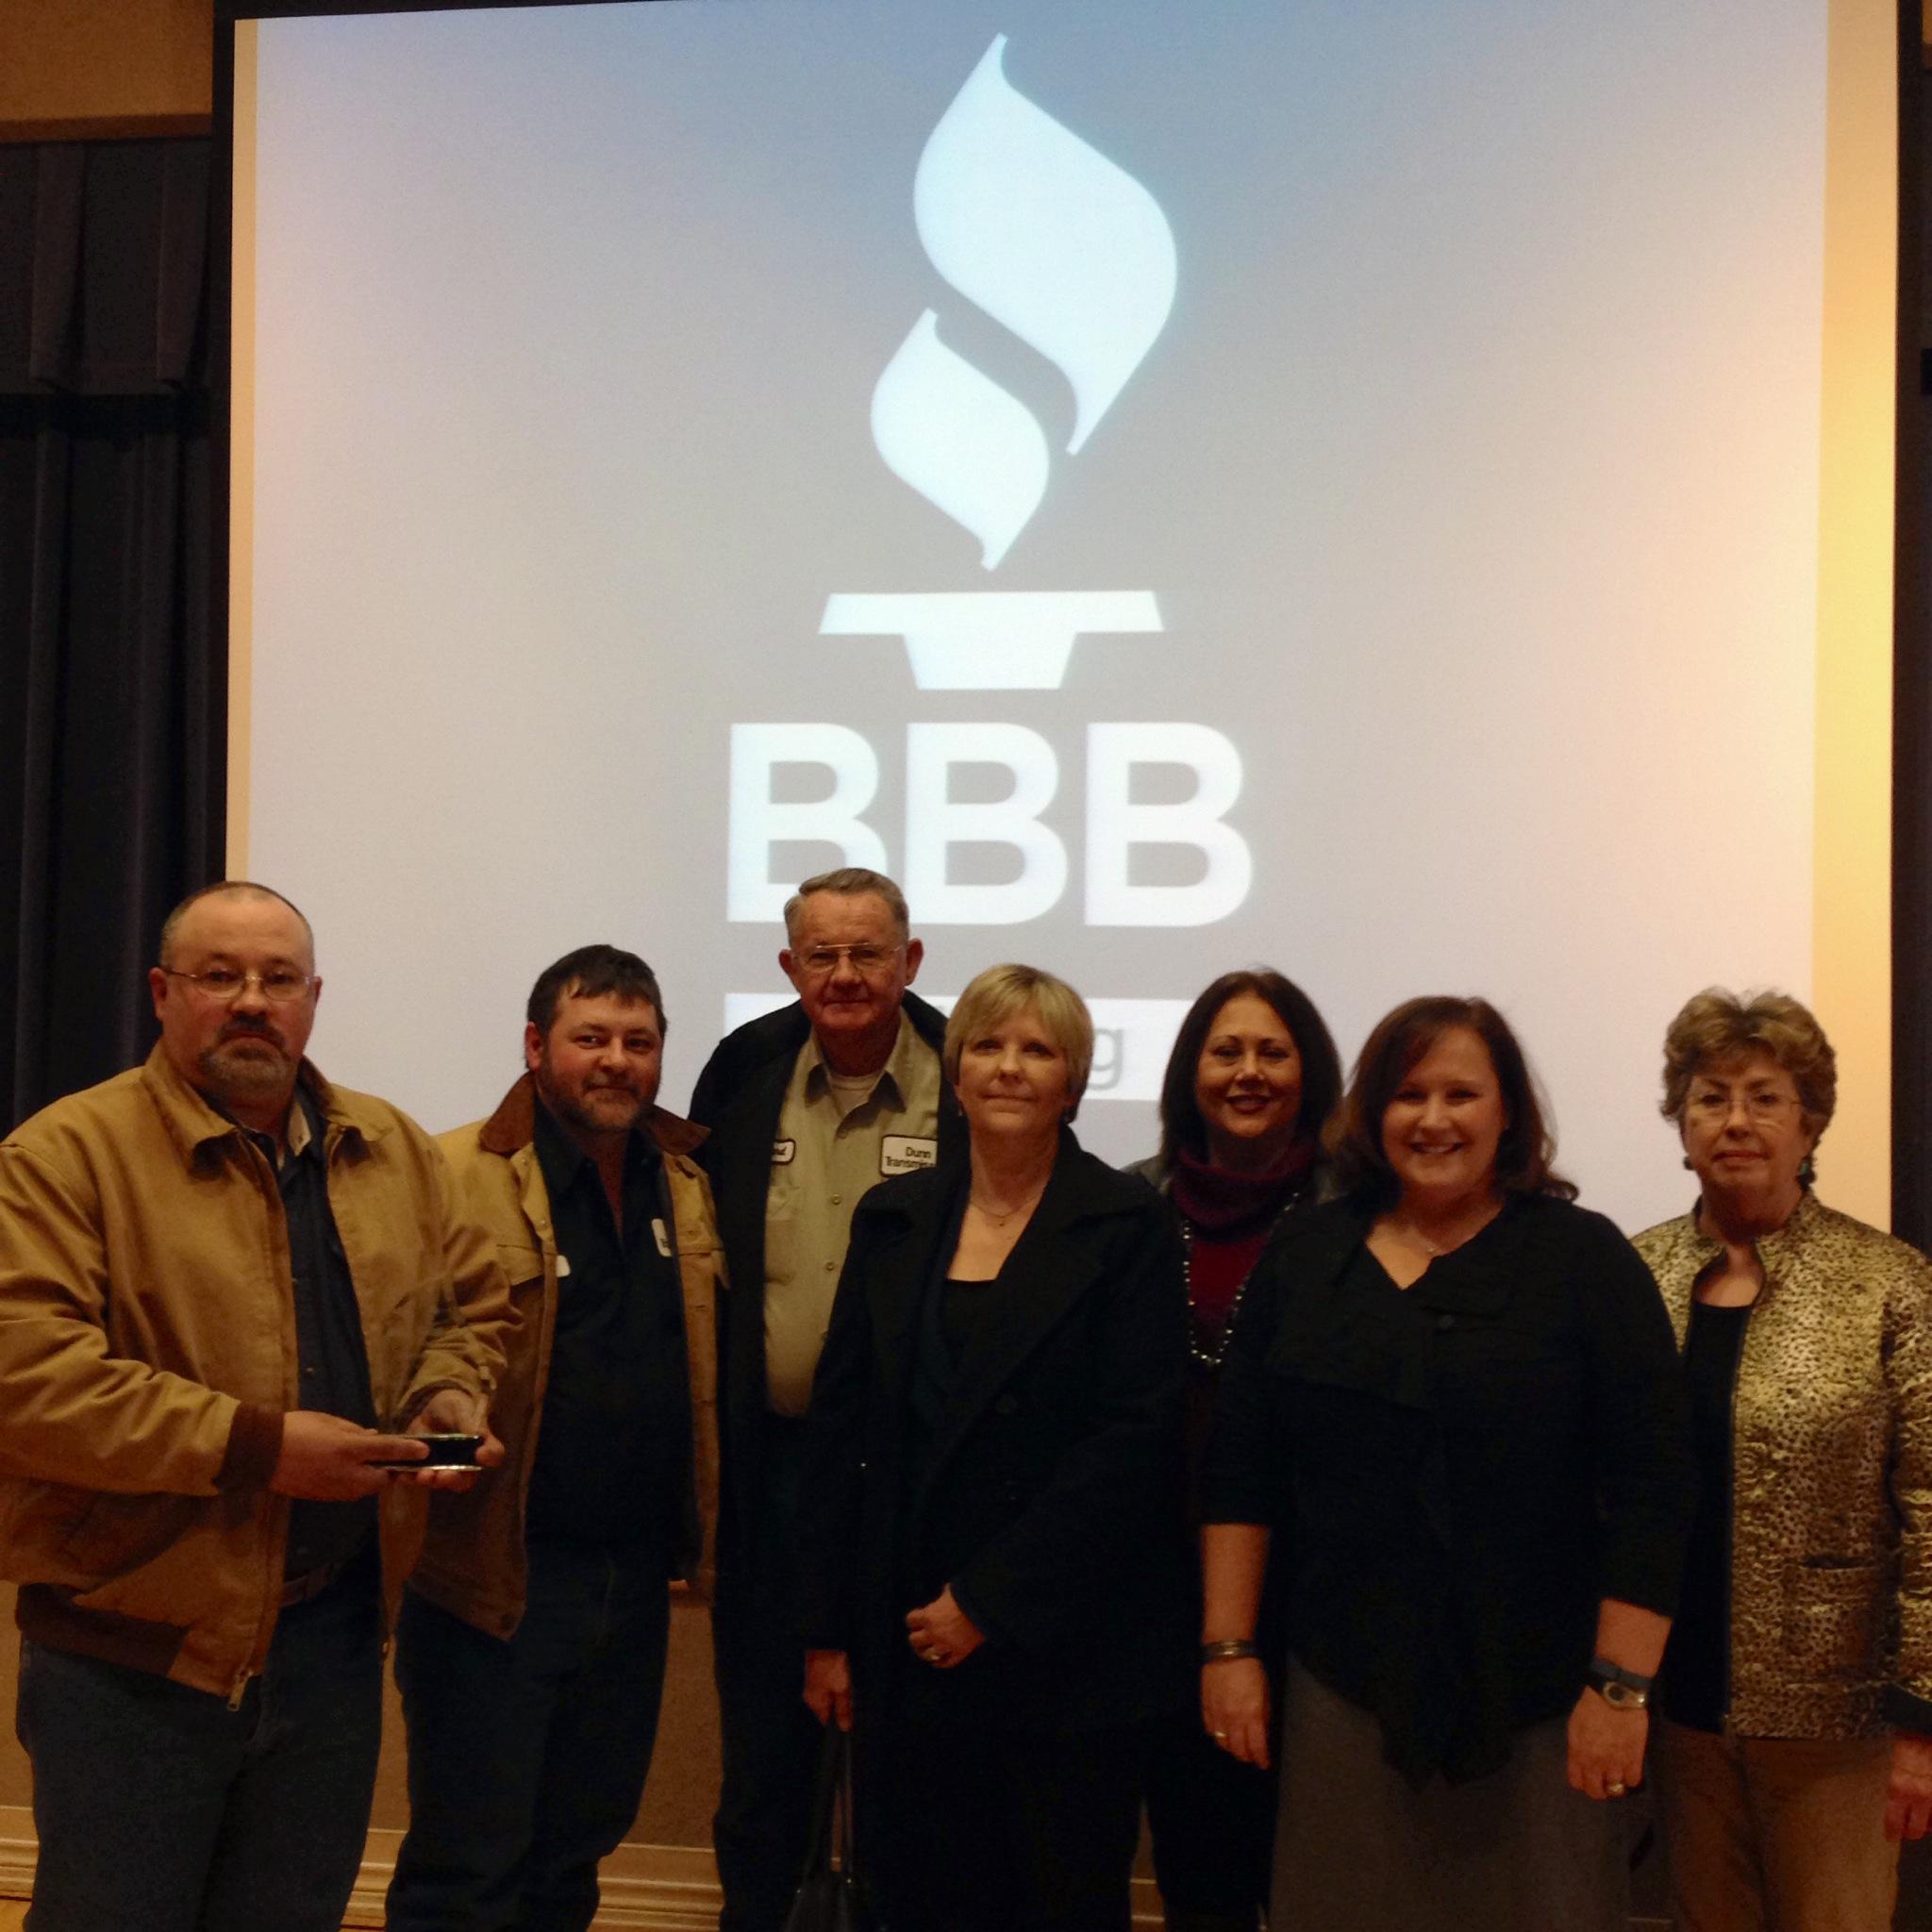 Receiving the Better business bureau of East Texas award of Excellence.